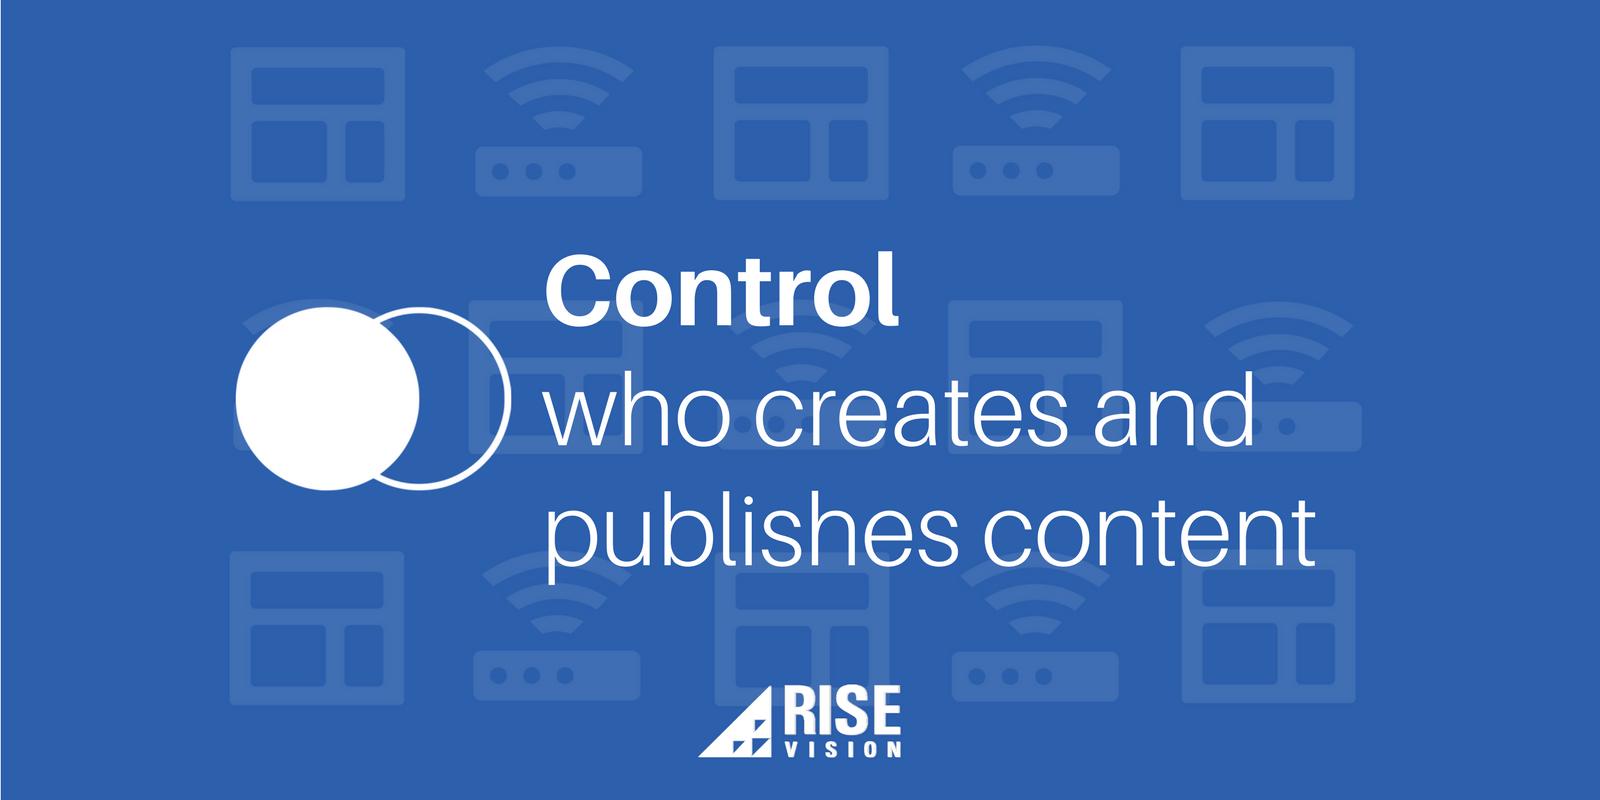 Rise Vision Digital Signage Content Management User Roles.png